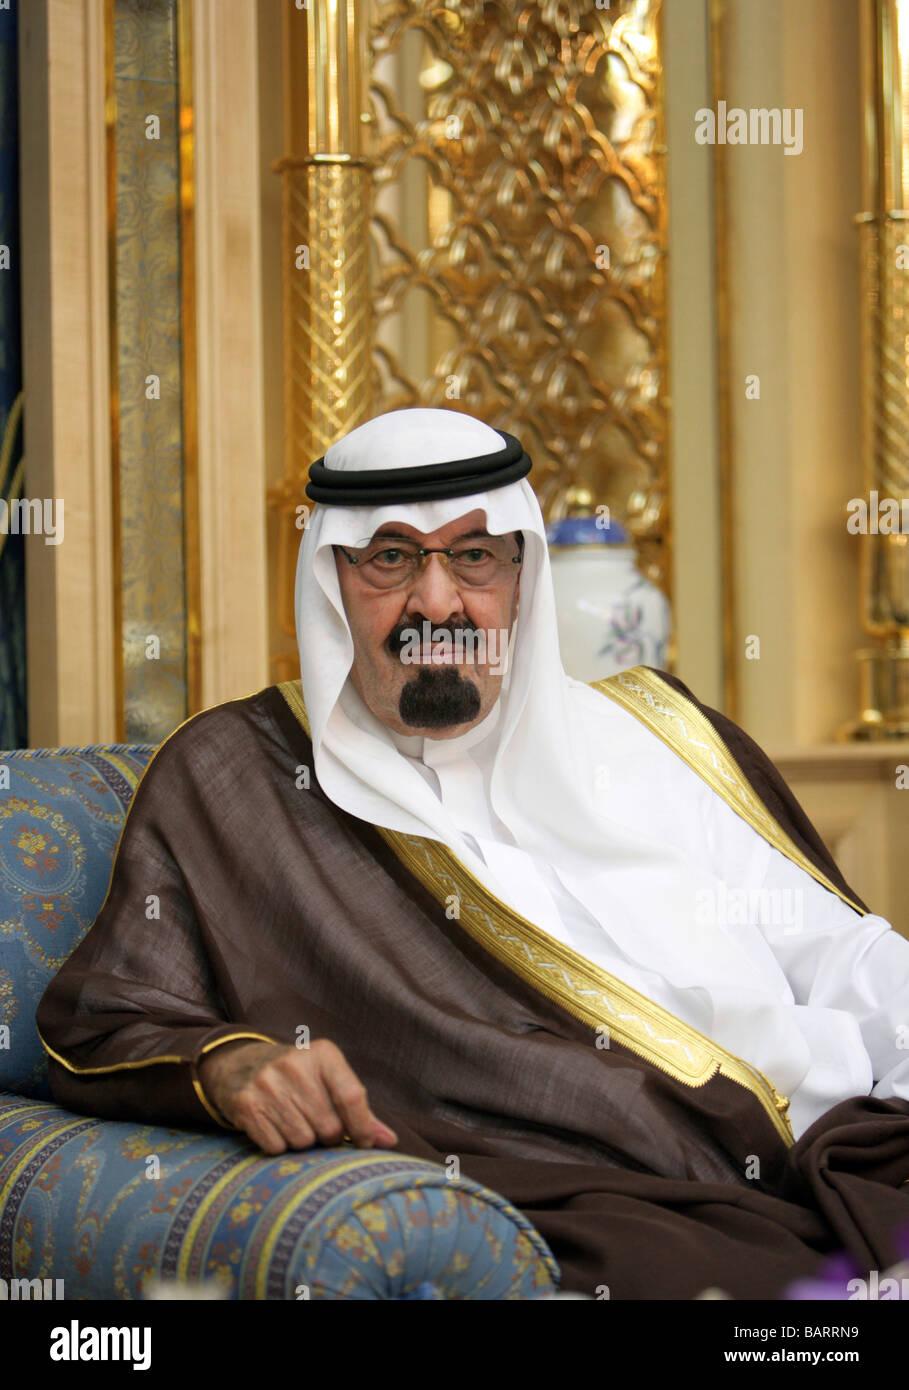 Abdullah bin Abdul Aziz Al Saud, Rey de Arabia Saudita Imagen De Stock